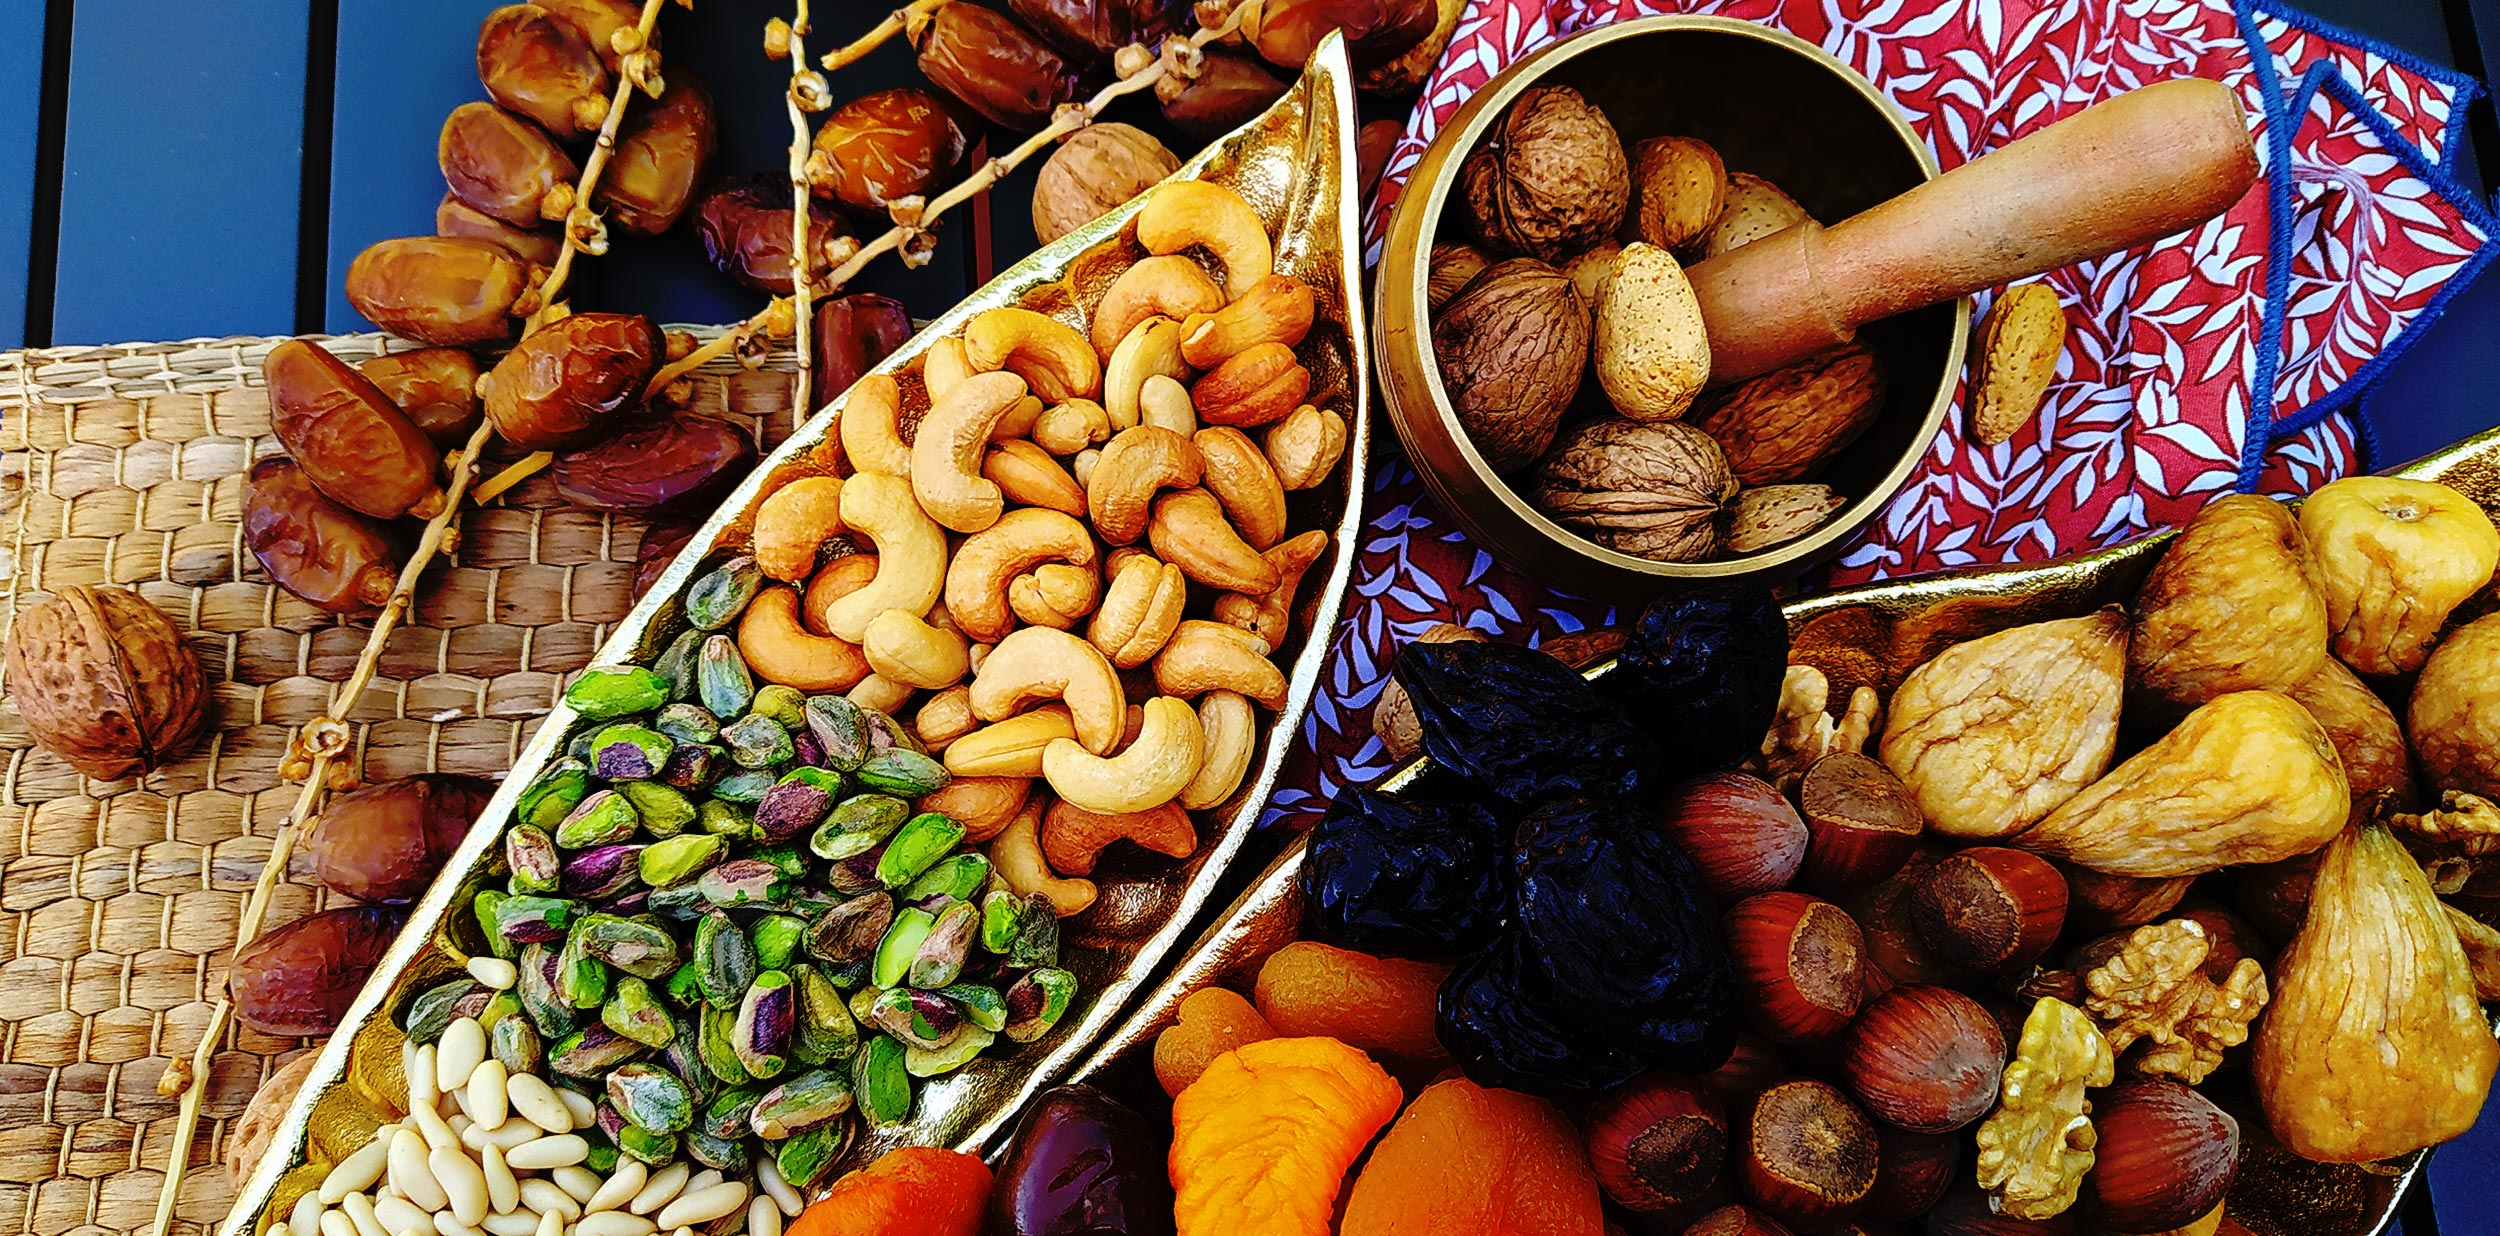 frutos secos herranz madrid